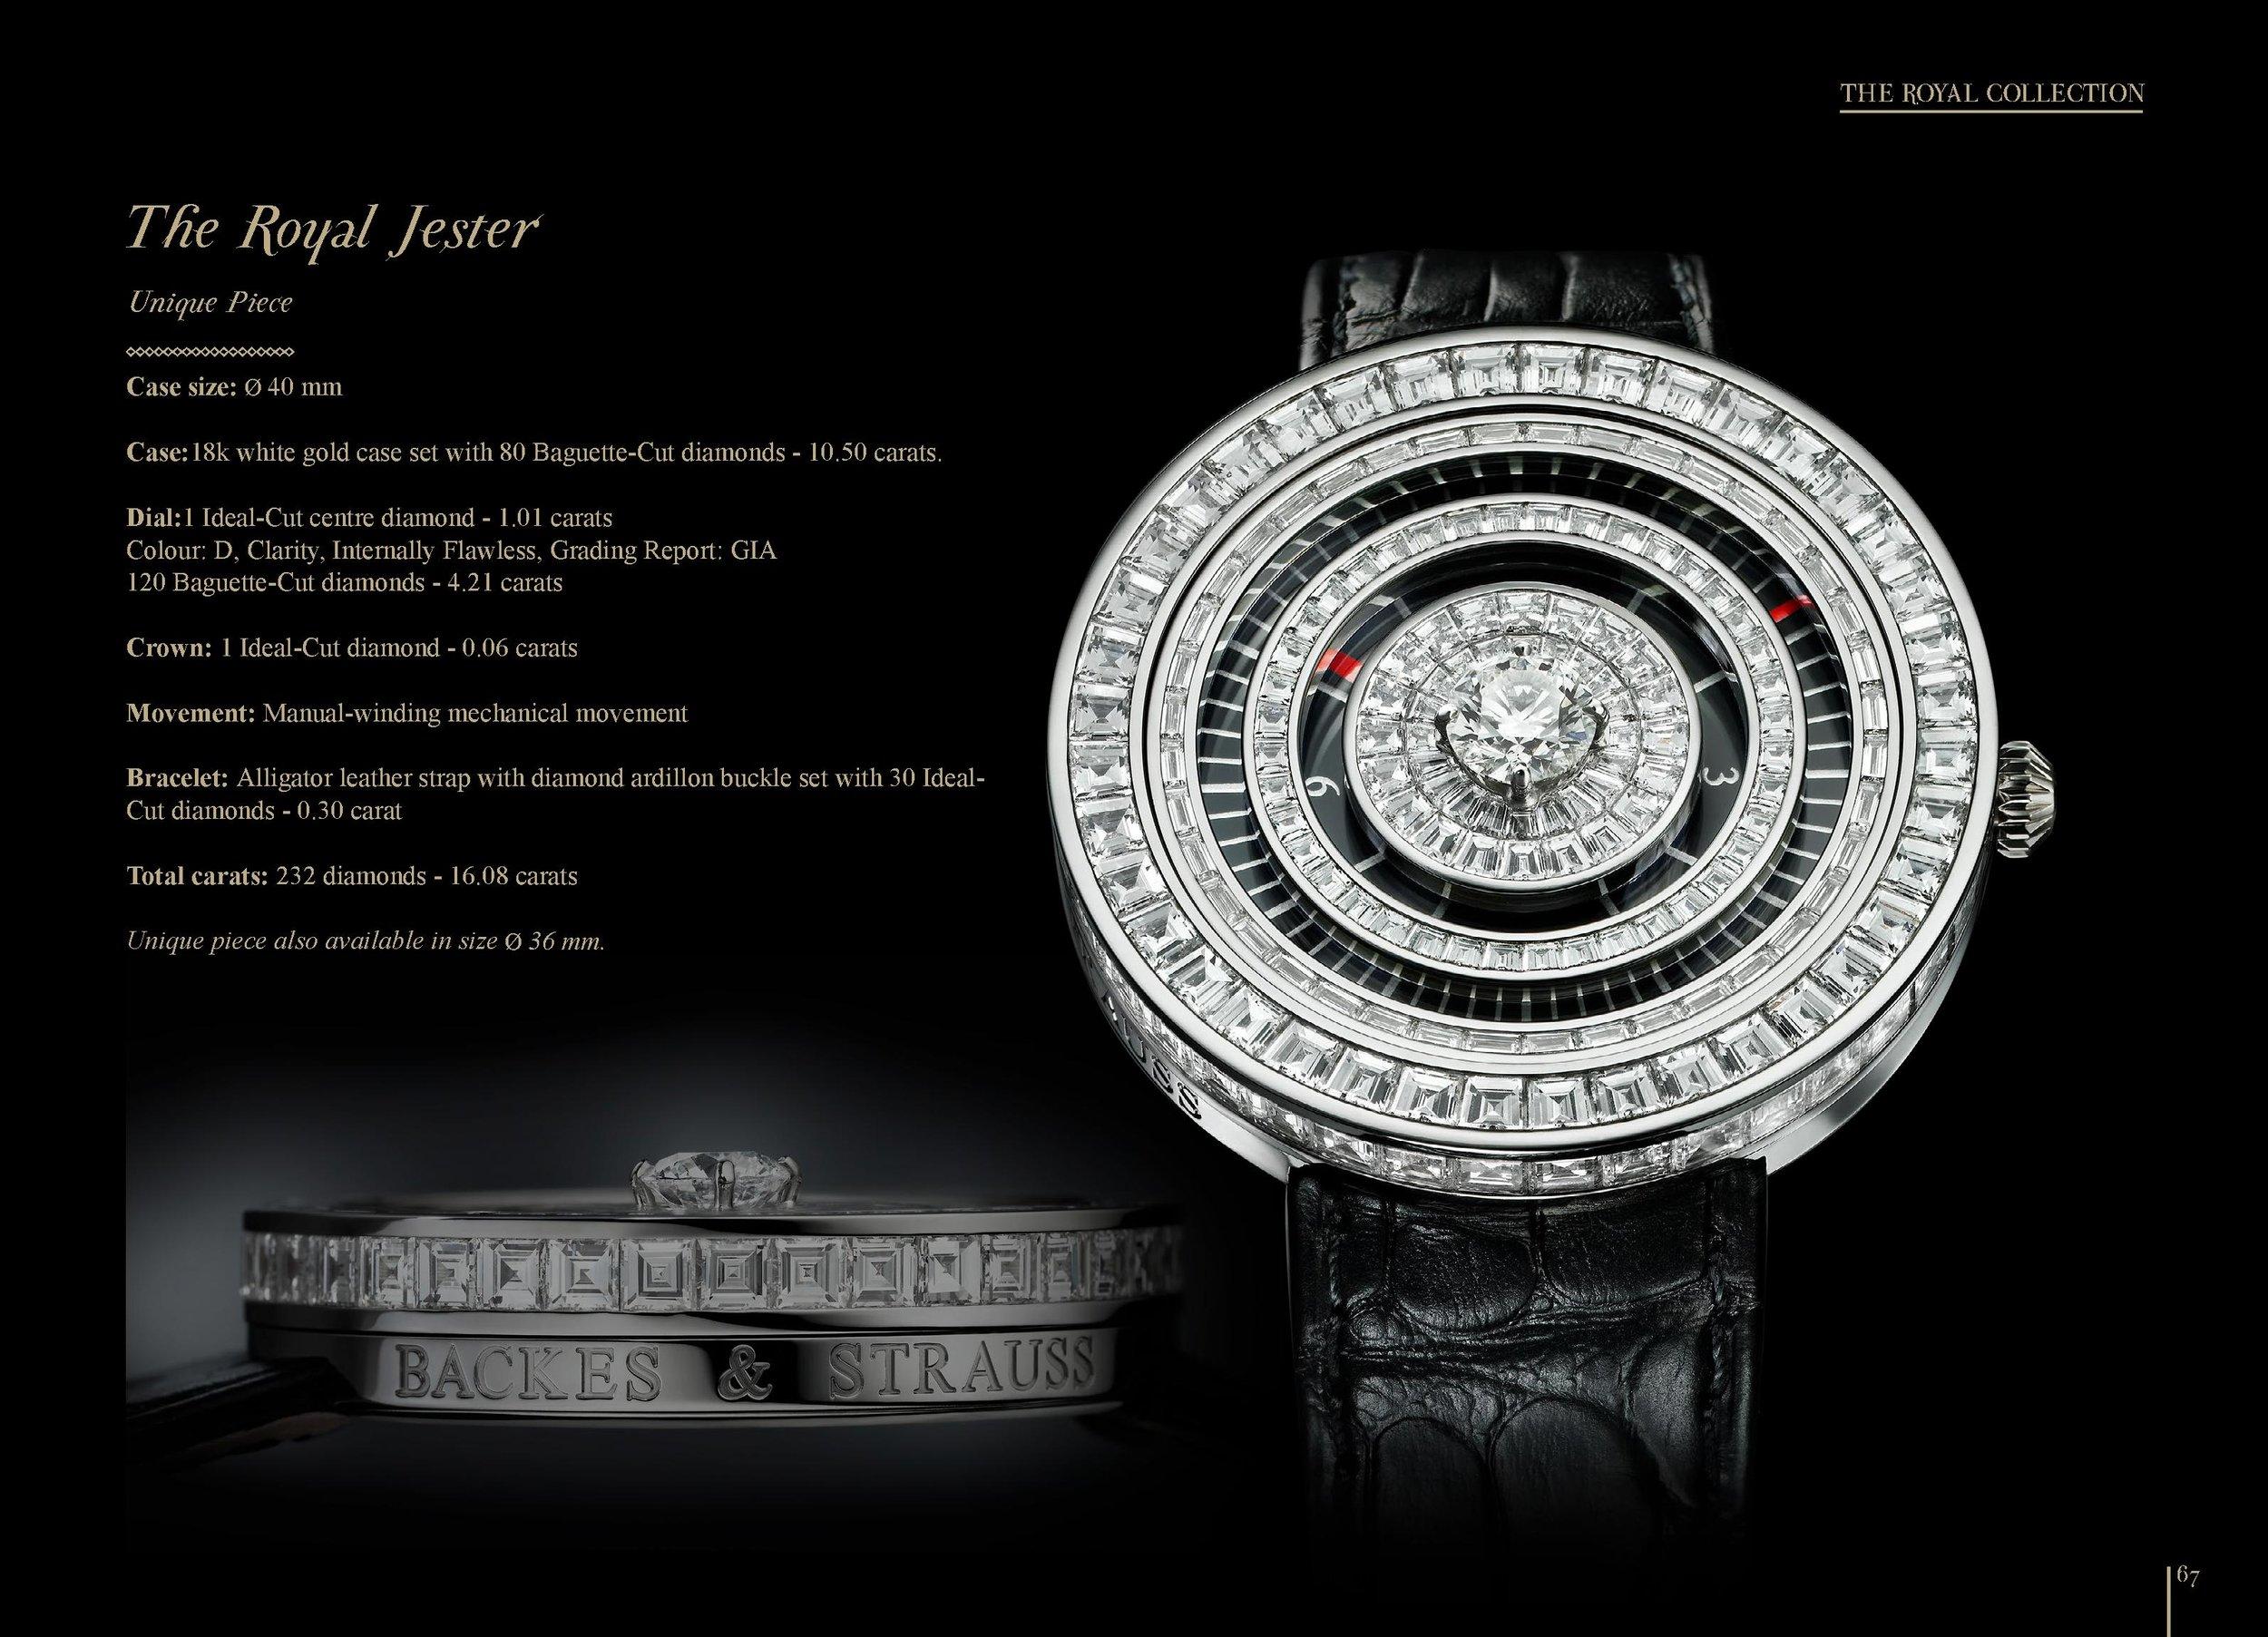 The Royal Jester diamond masterpiece